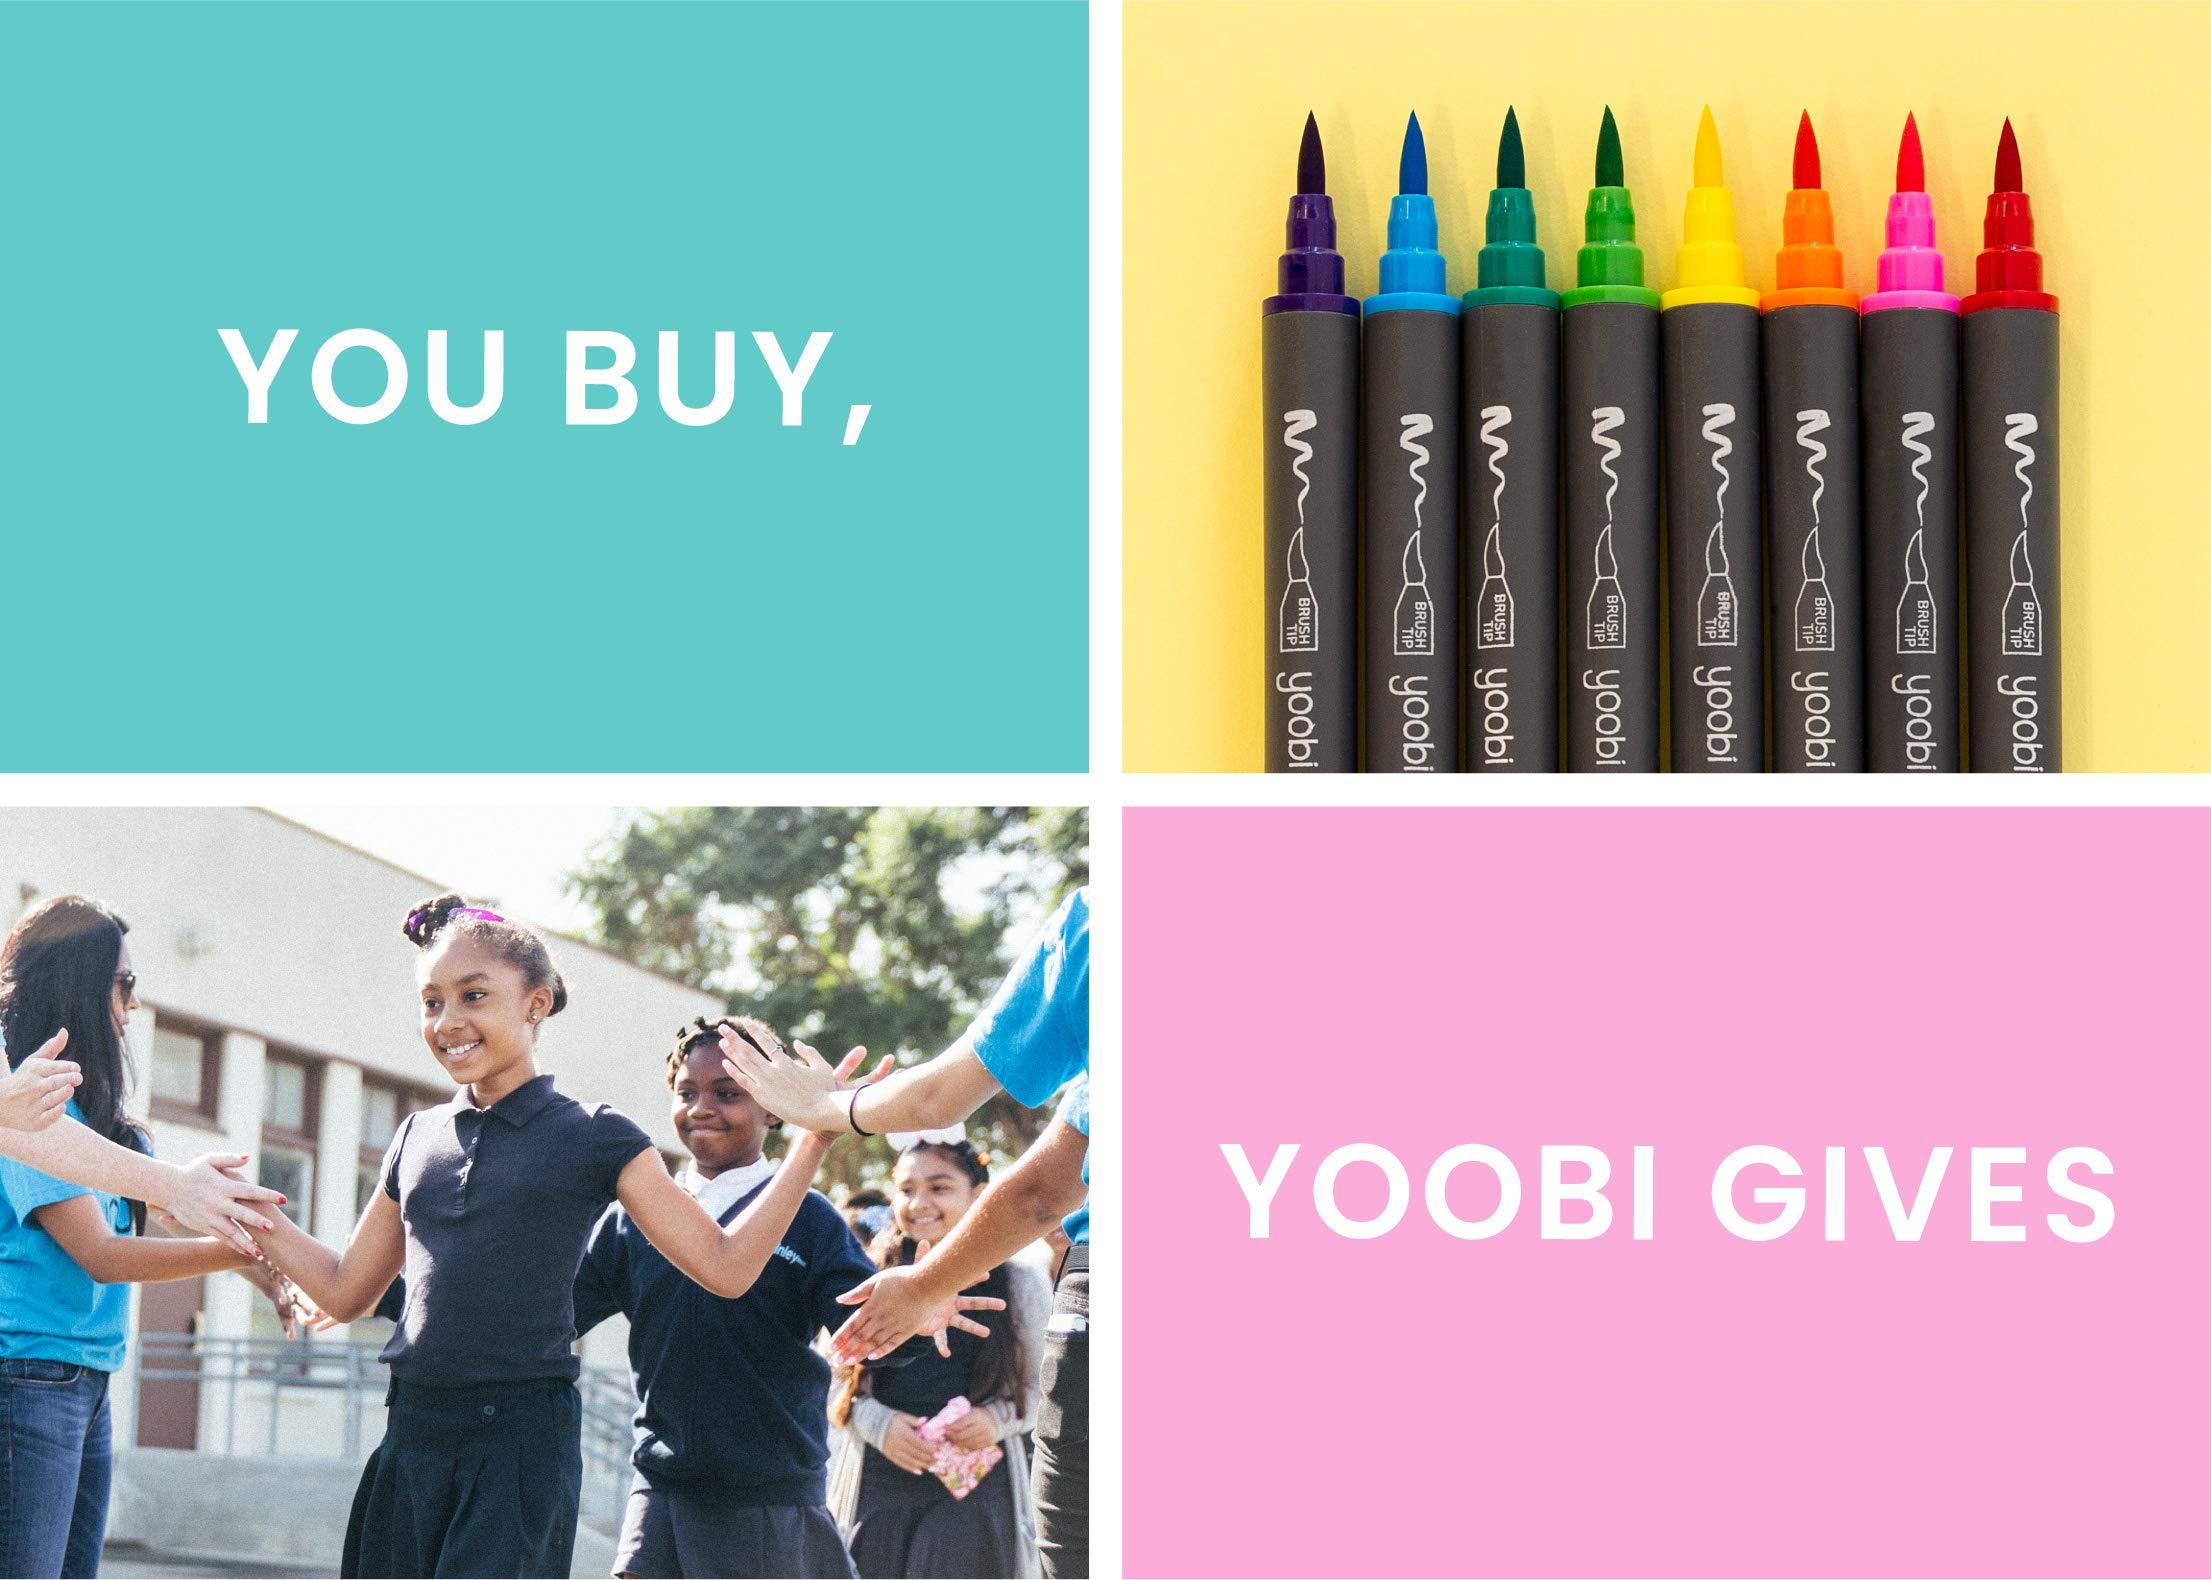 Yoobi Mini Gel Pens 24-Pack & Carrying Case   Neon, Metallic, Glitter Shades   Multicolor Ink   1.0mm Medium Tip   School, Home, Office Use by Yoobi